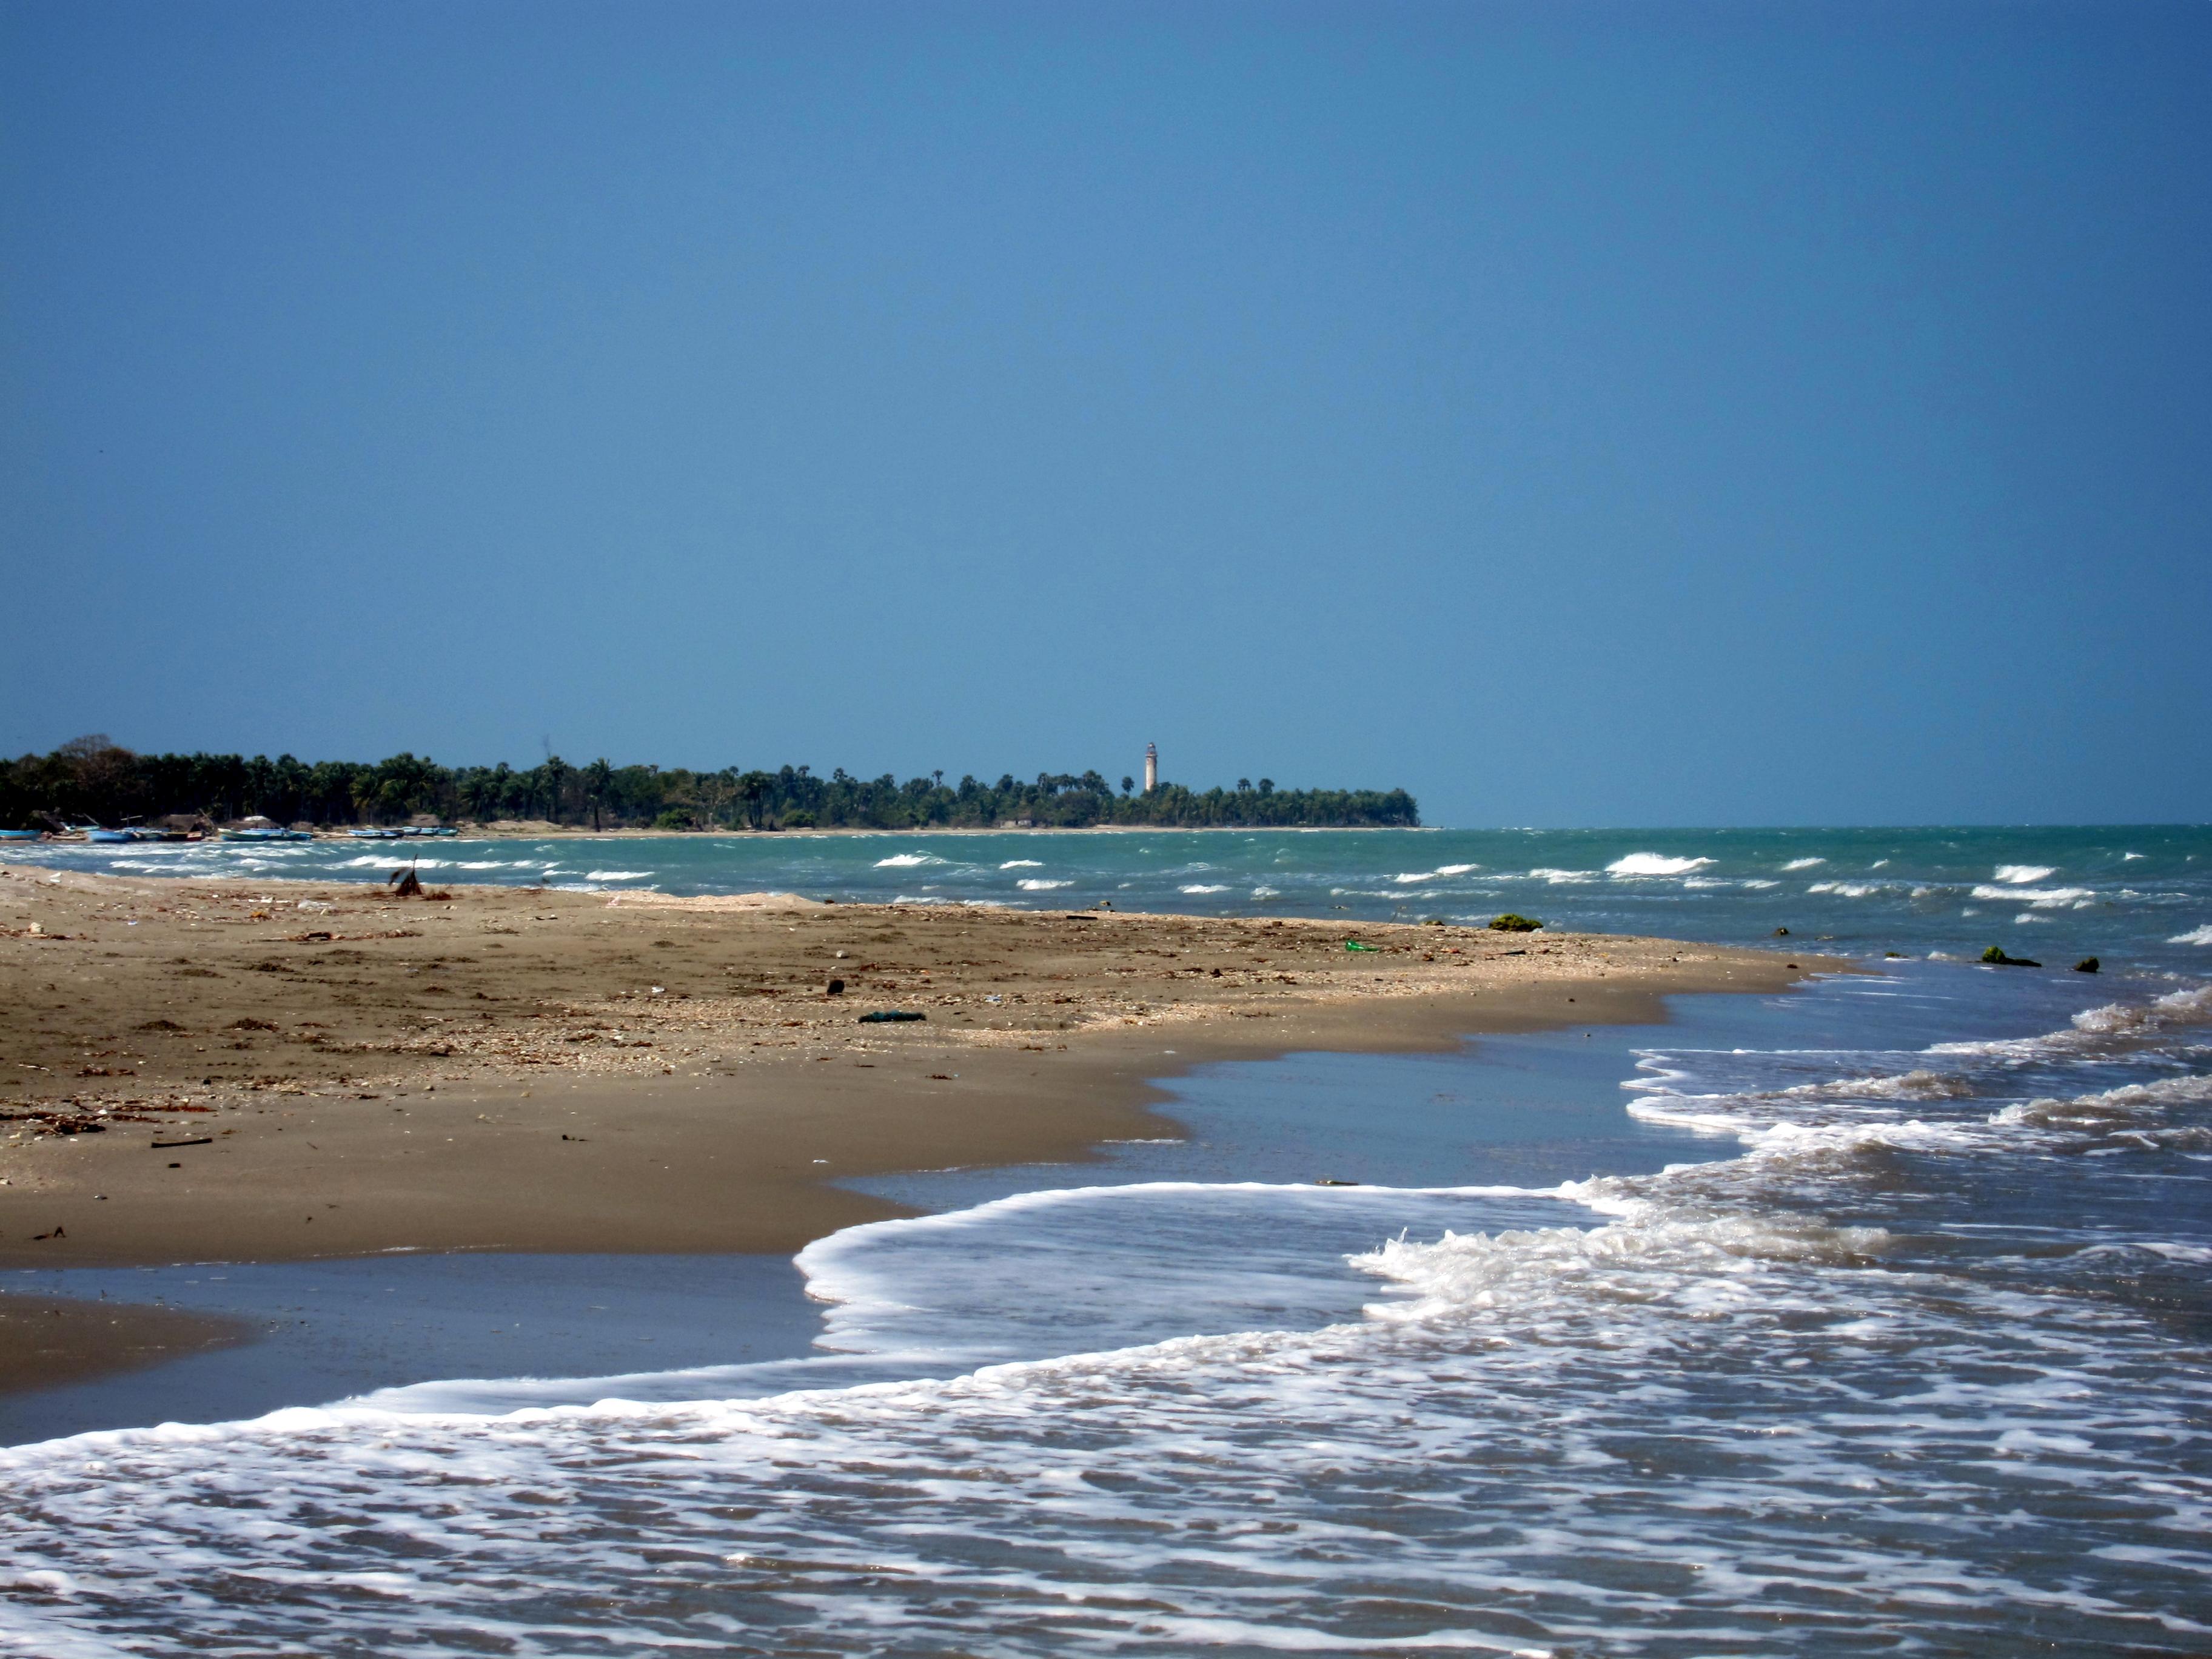 File:Casuarina Beach.jpg - Wikimedia Commons Beach